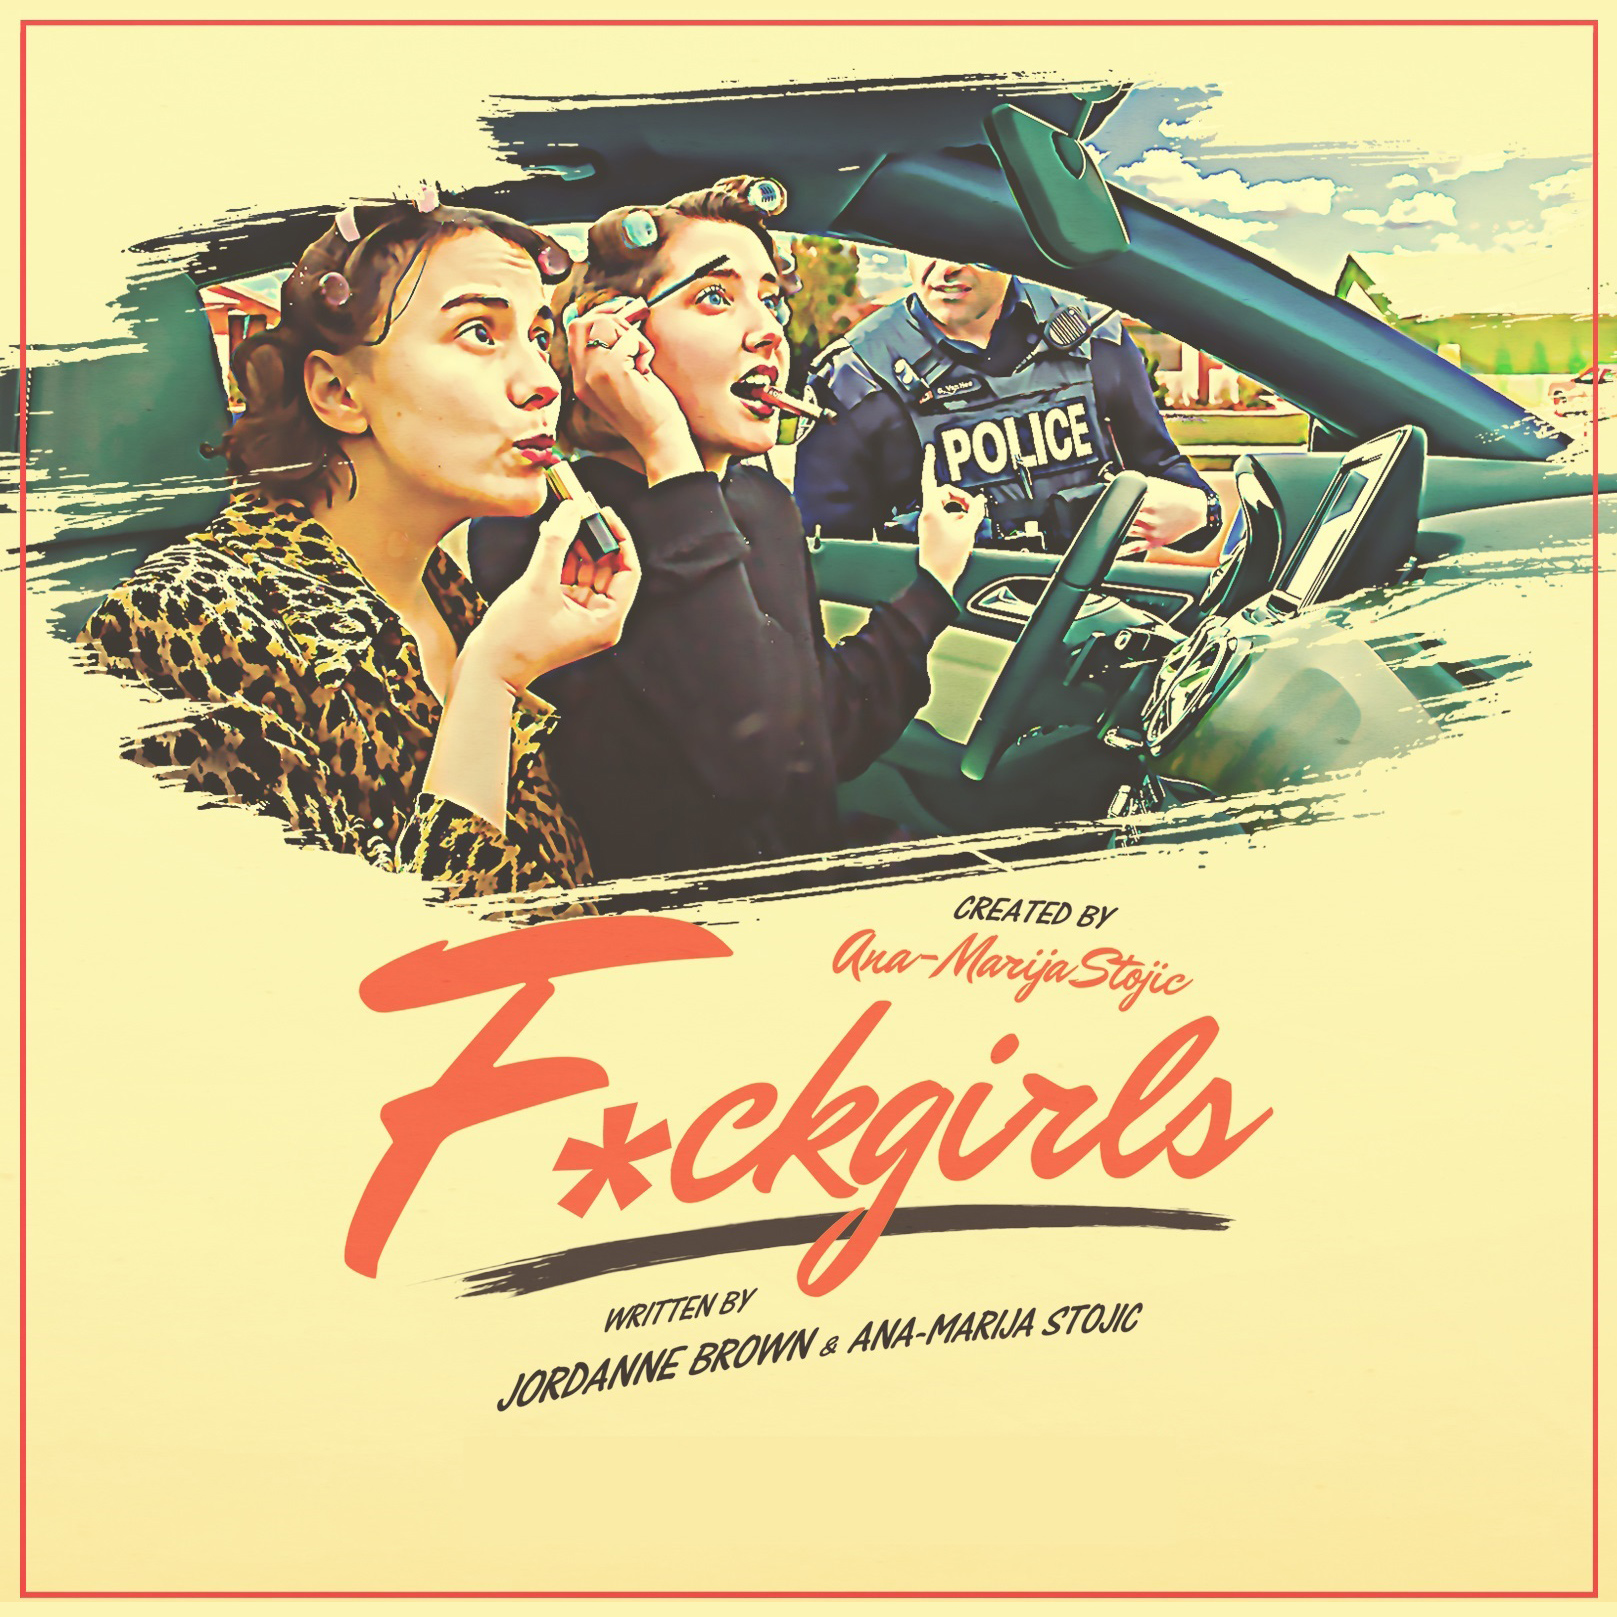 Fckgirls